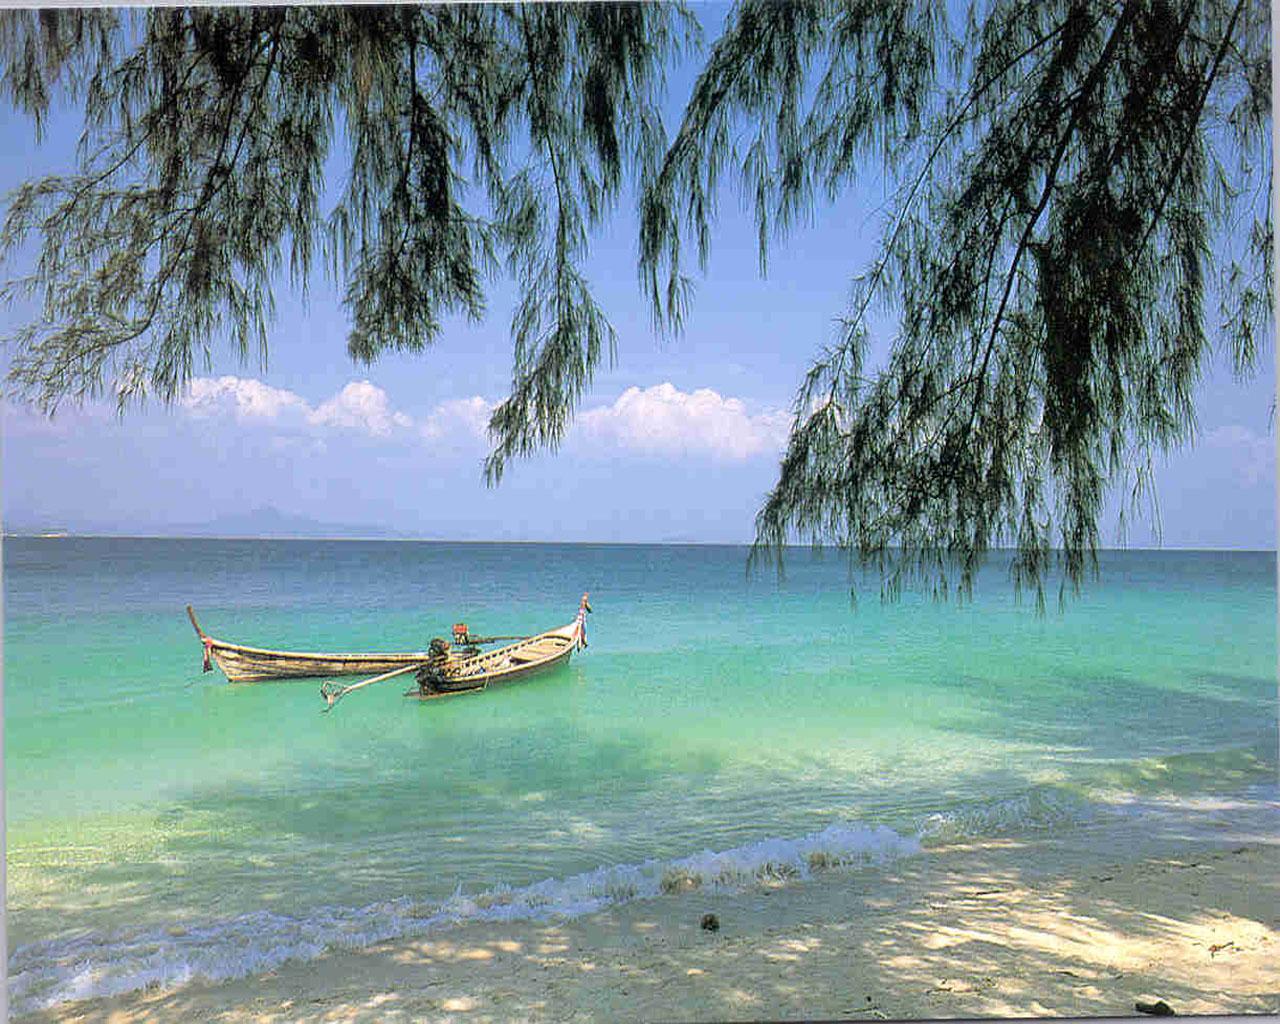 Tropical Beach Screensavers And Wallpaper: Tropical Beach Screensavers And Wallpaper